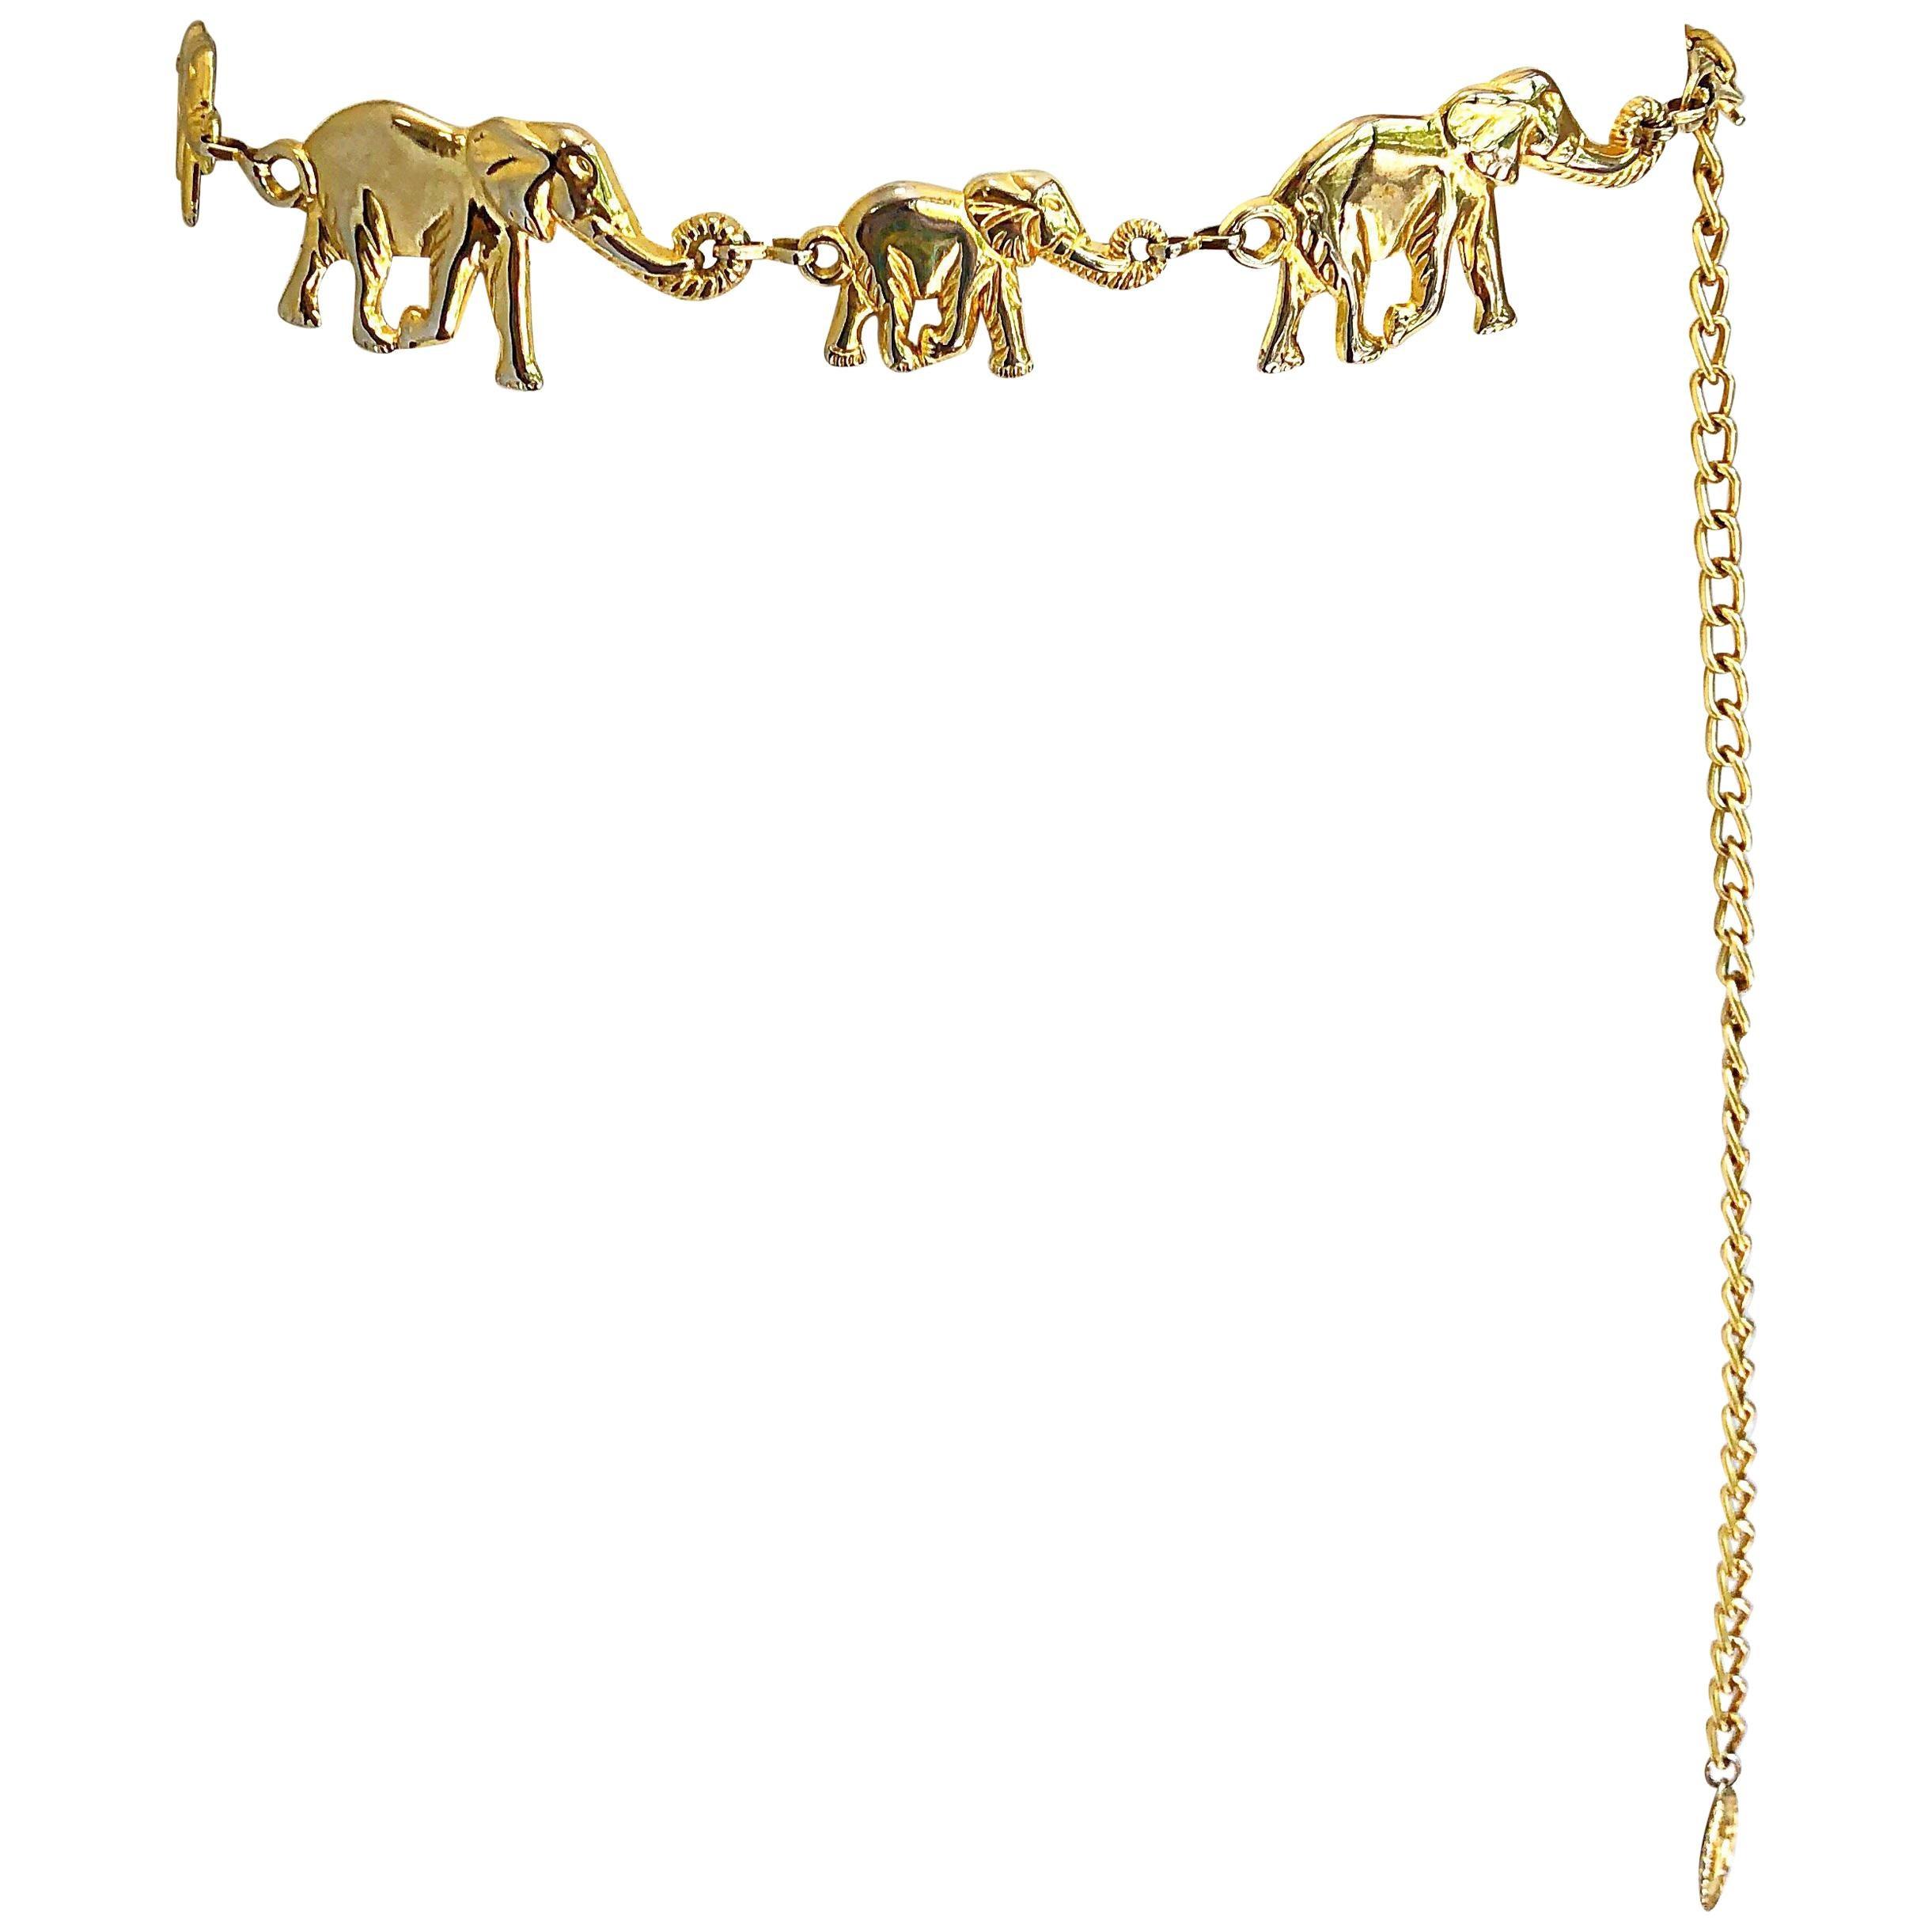 Amazing 1990s Gold Metal Elephant Novelty Vintage 90s Chain Bold Belt / Neclace